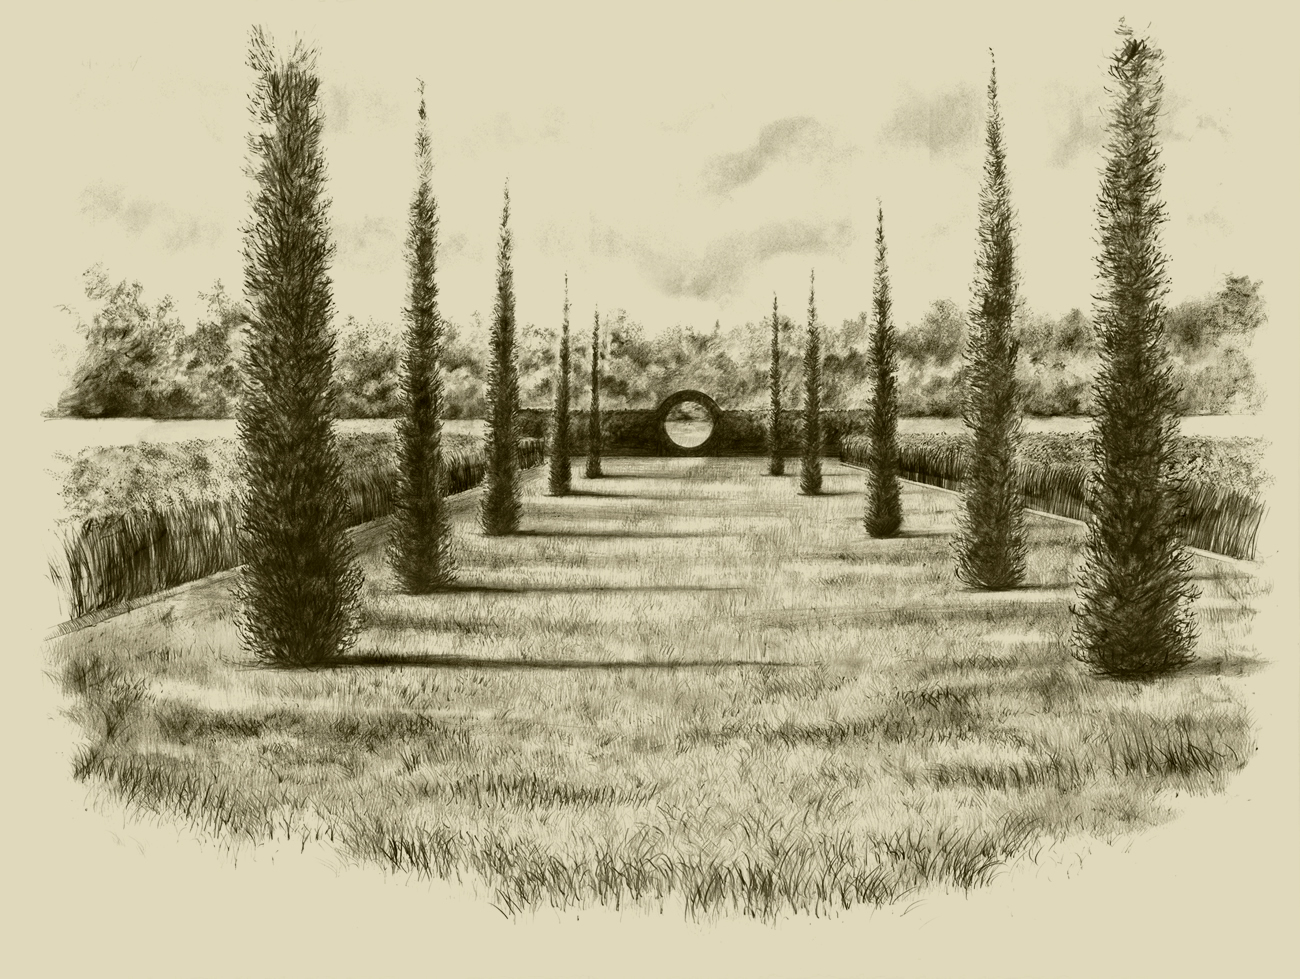 Landschapsarchitectuur